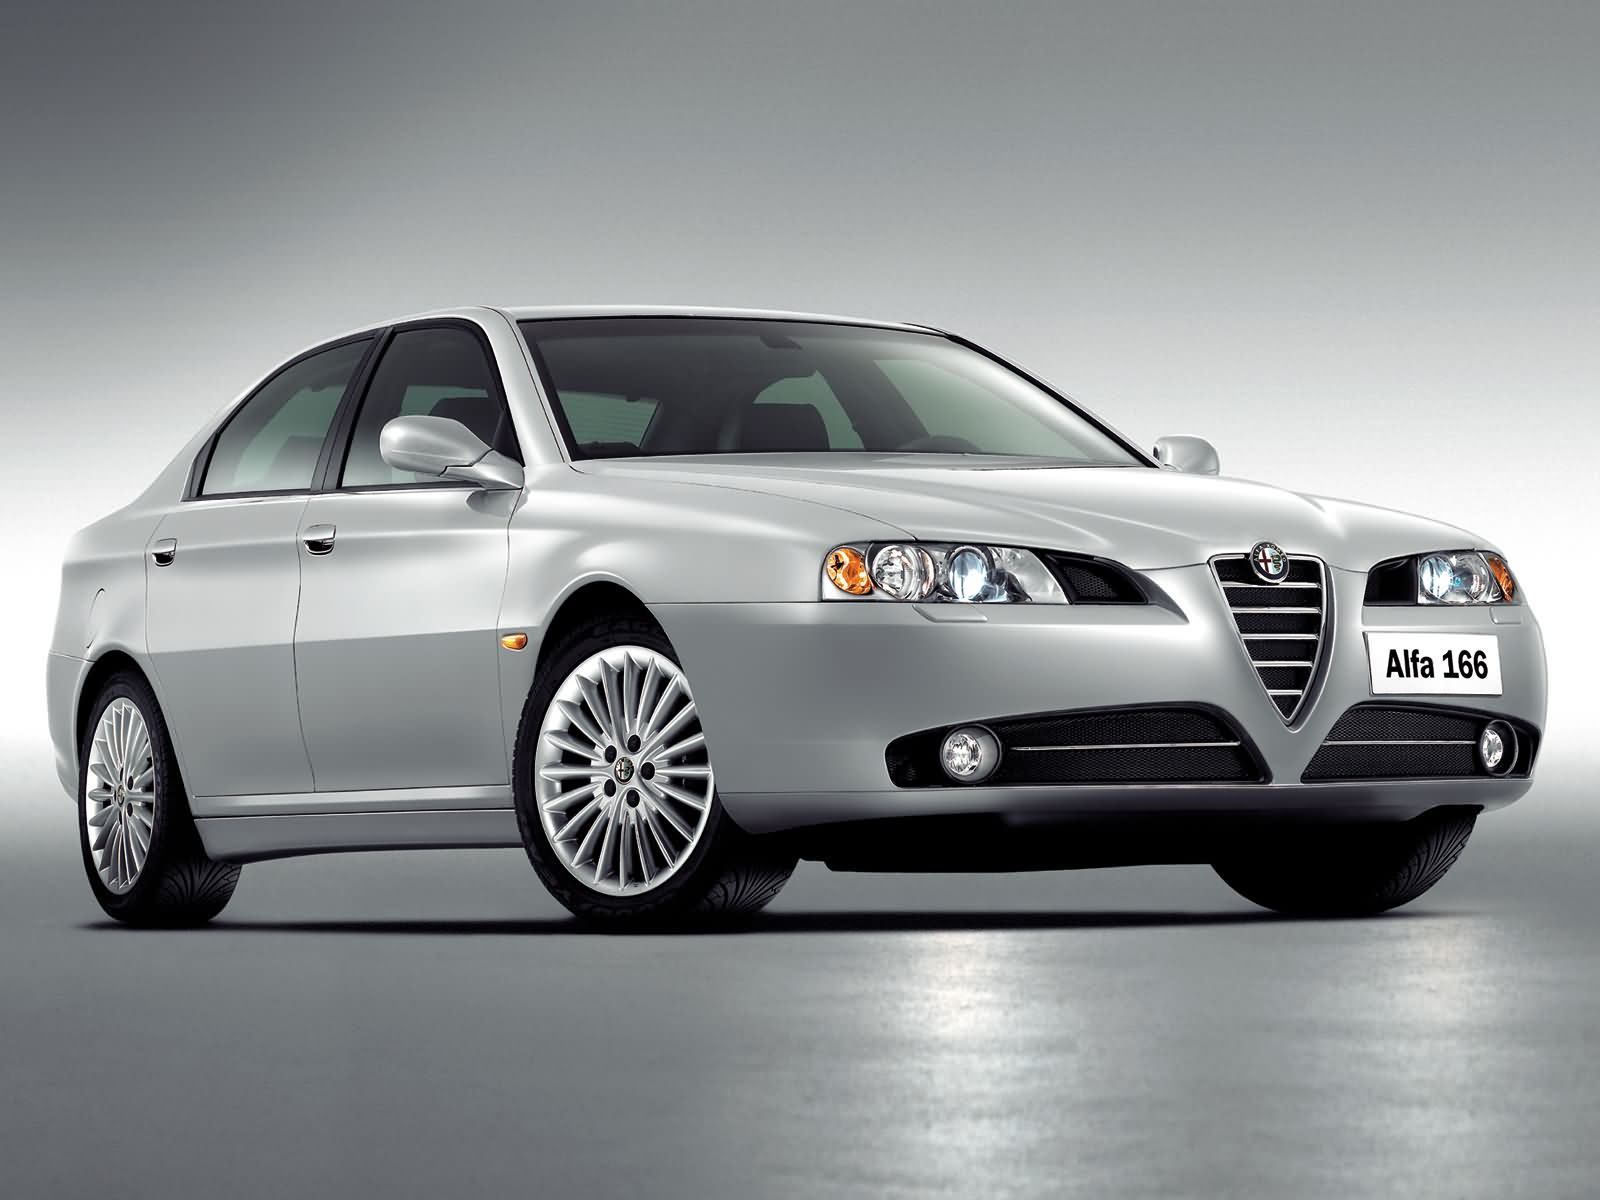 Bmw I8 Concept Alfa Romeo 166 Pc Car Insurance And Car